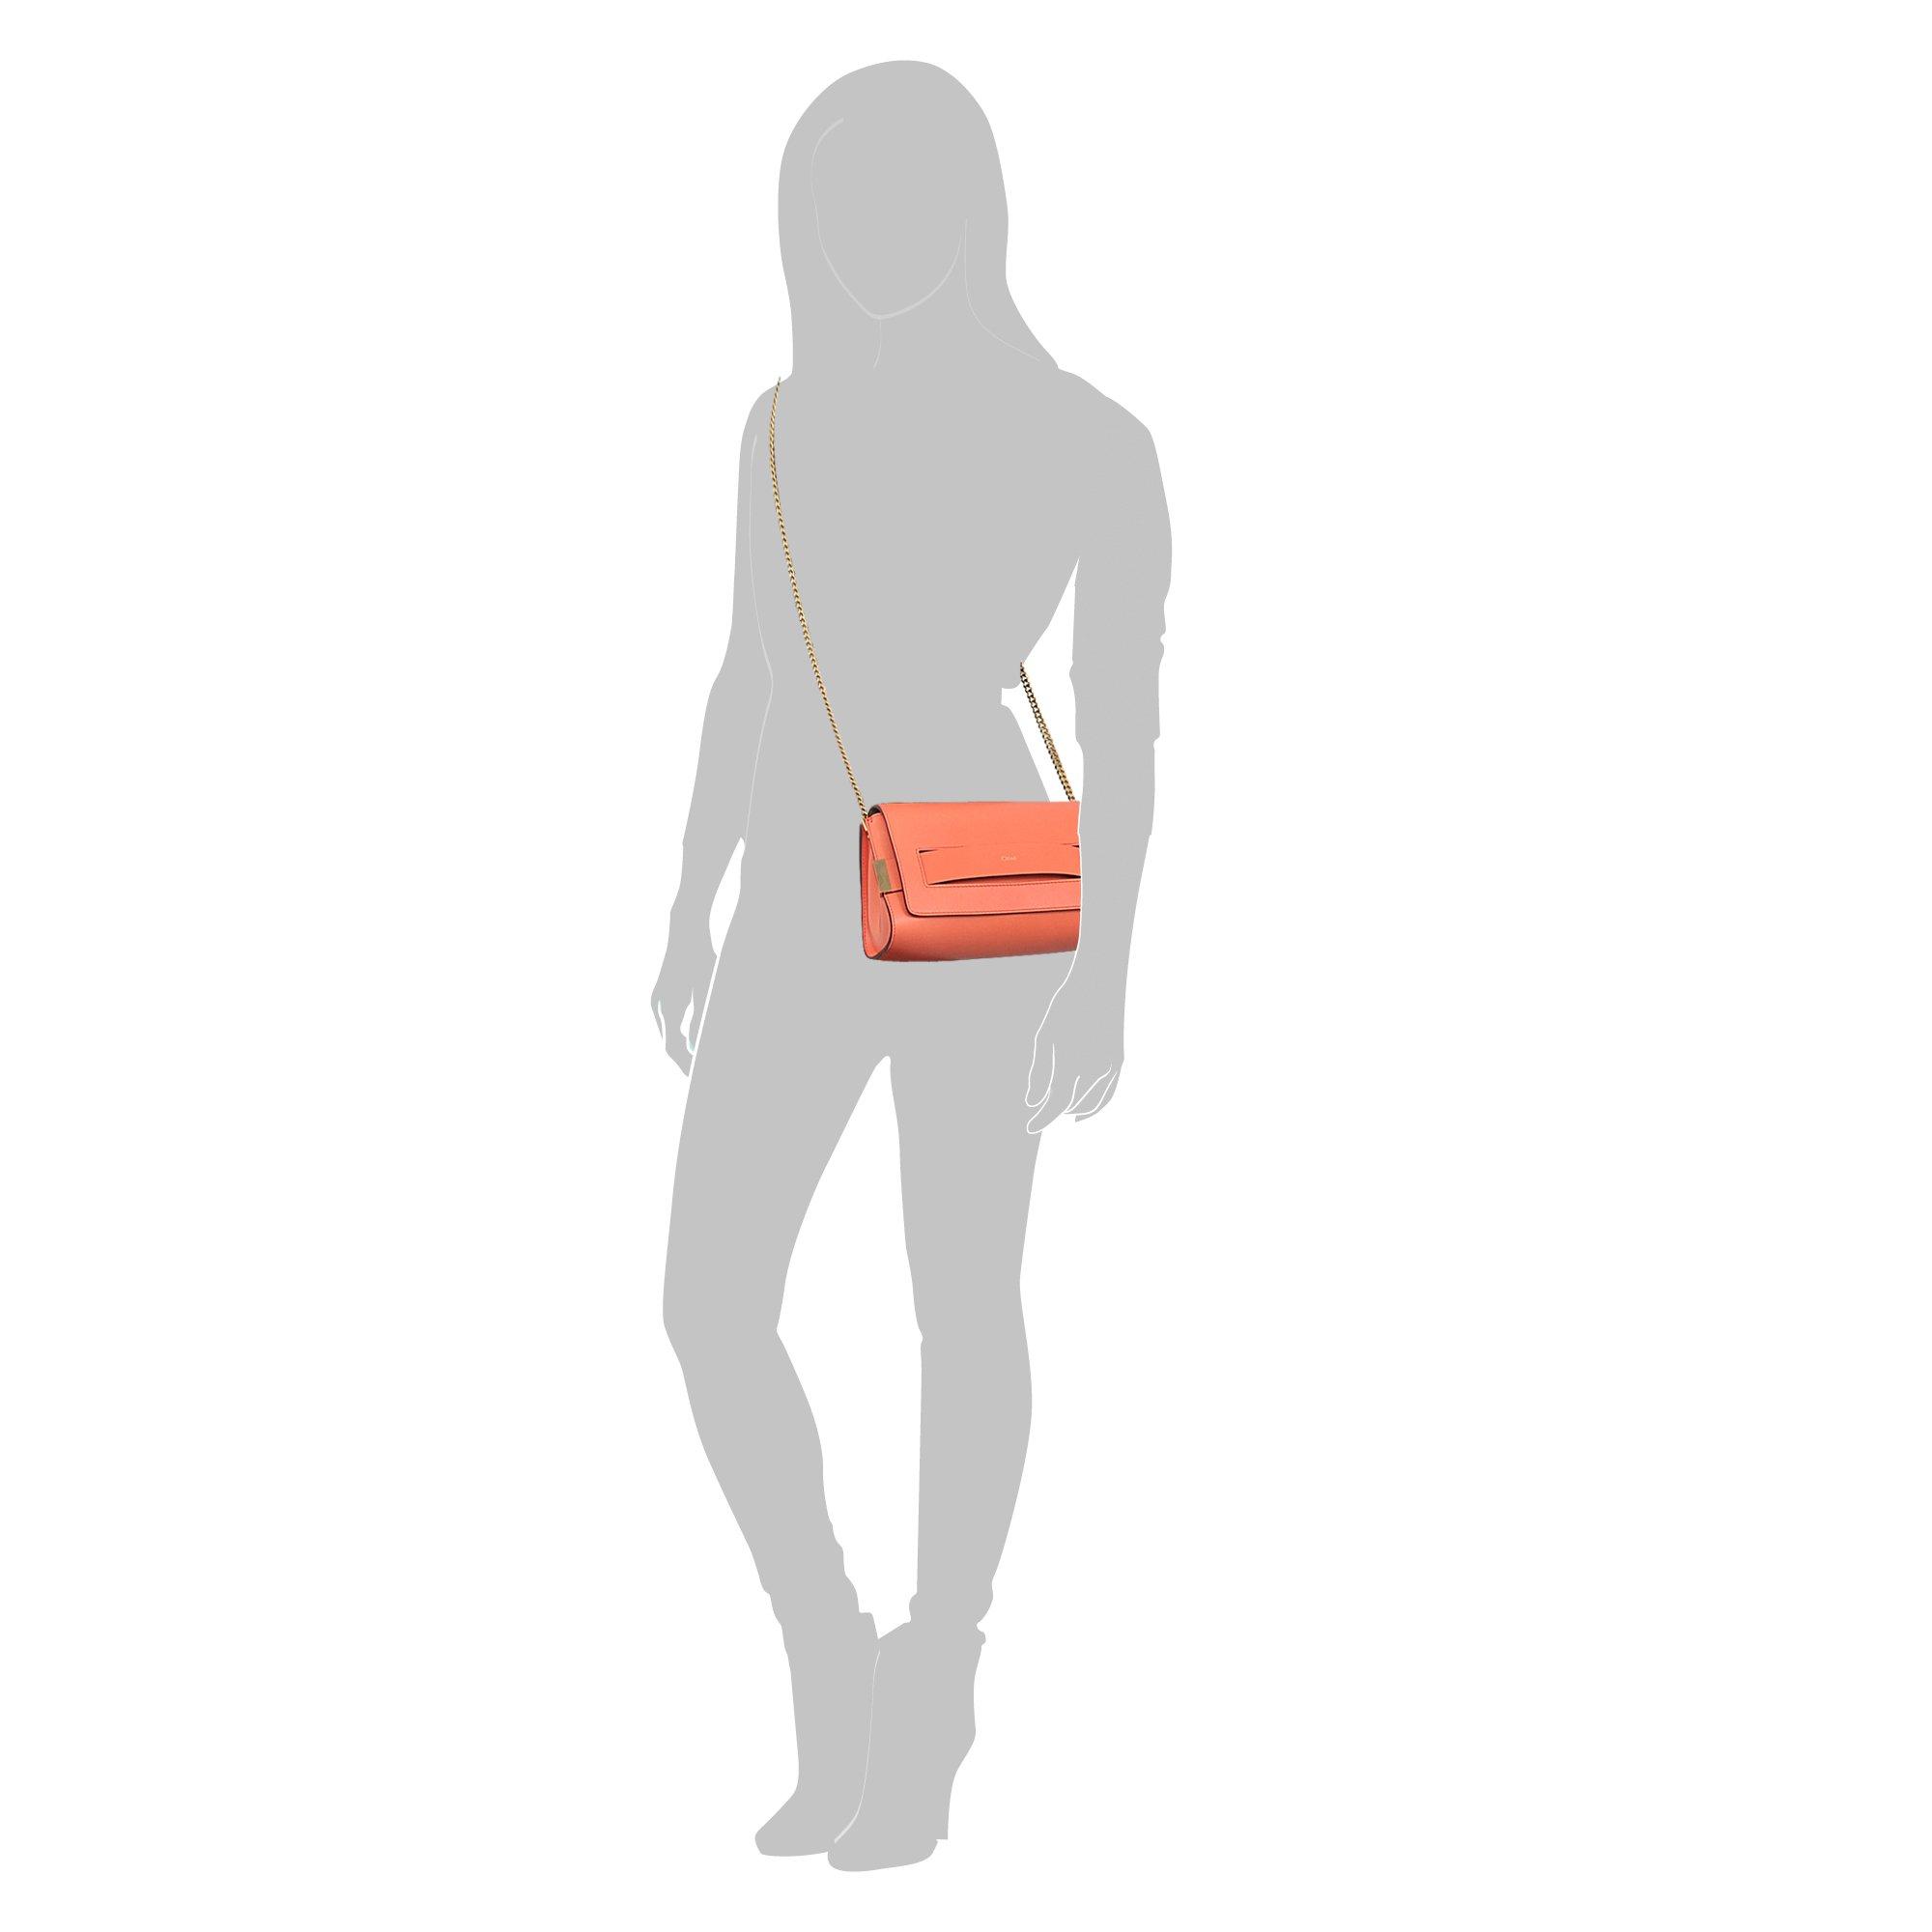 knock off chloe bag - Chlo�� Elle Medium Clutch Bag in Orange | Lyst